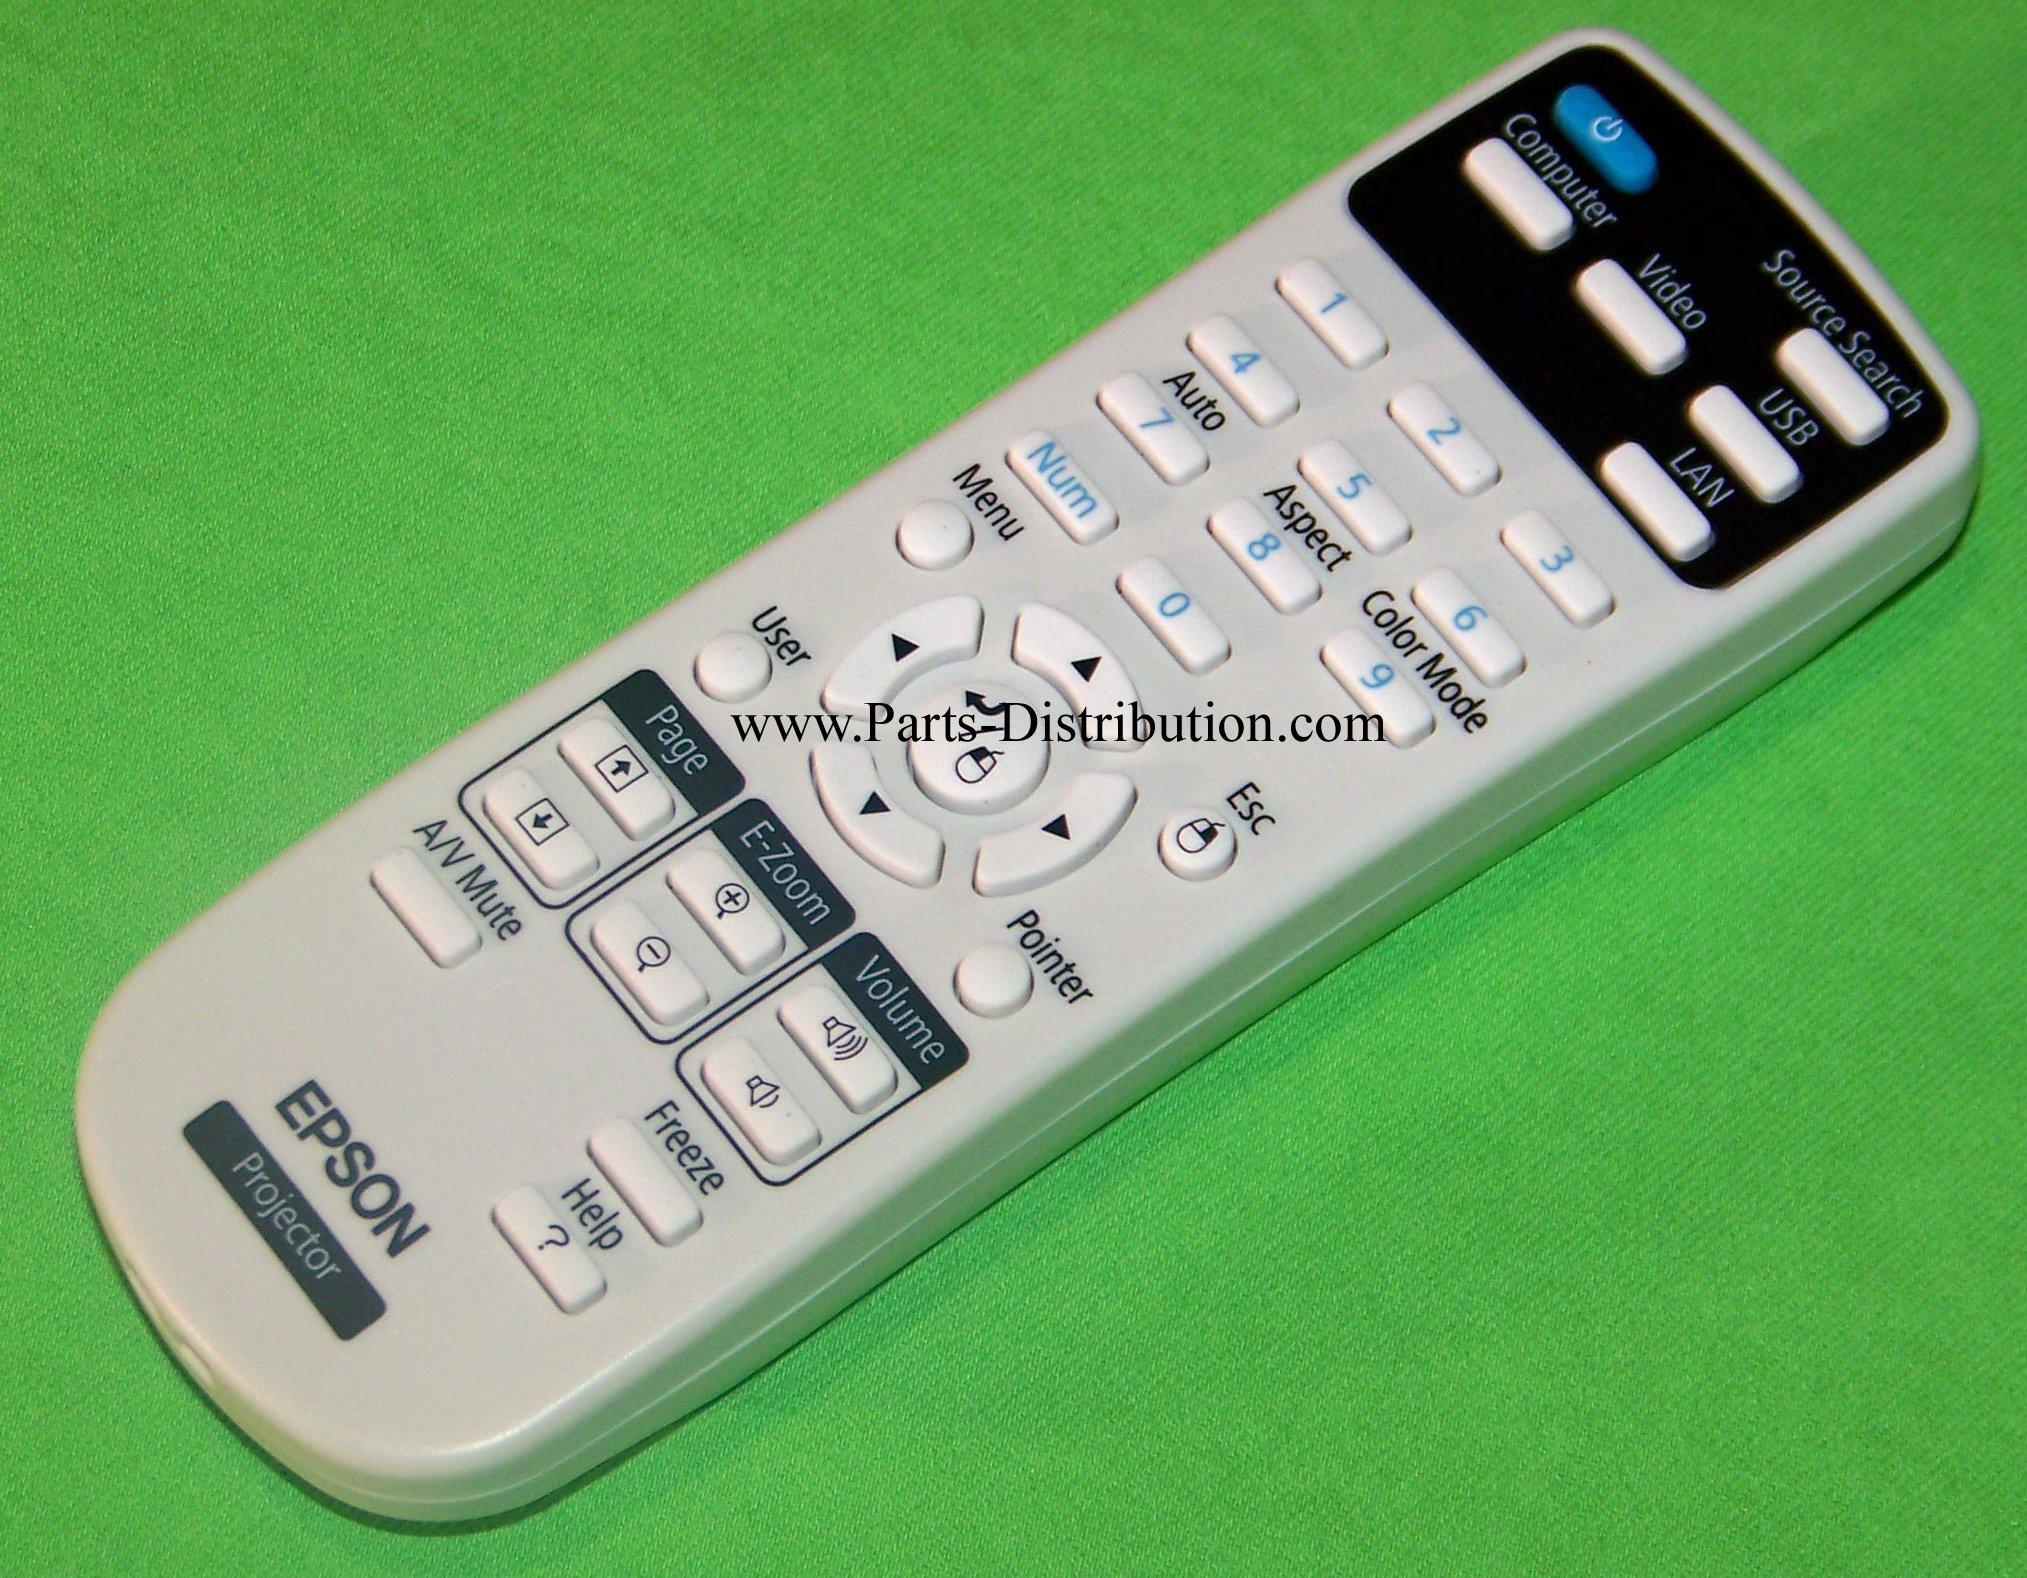 Epson Remote Control: PowerLite S17, PowerLite W17, PowerLite X17, PowerLite Home Cinema 725HD & 730HD by Epson